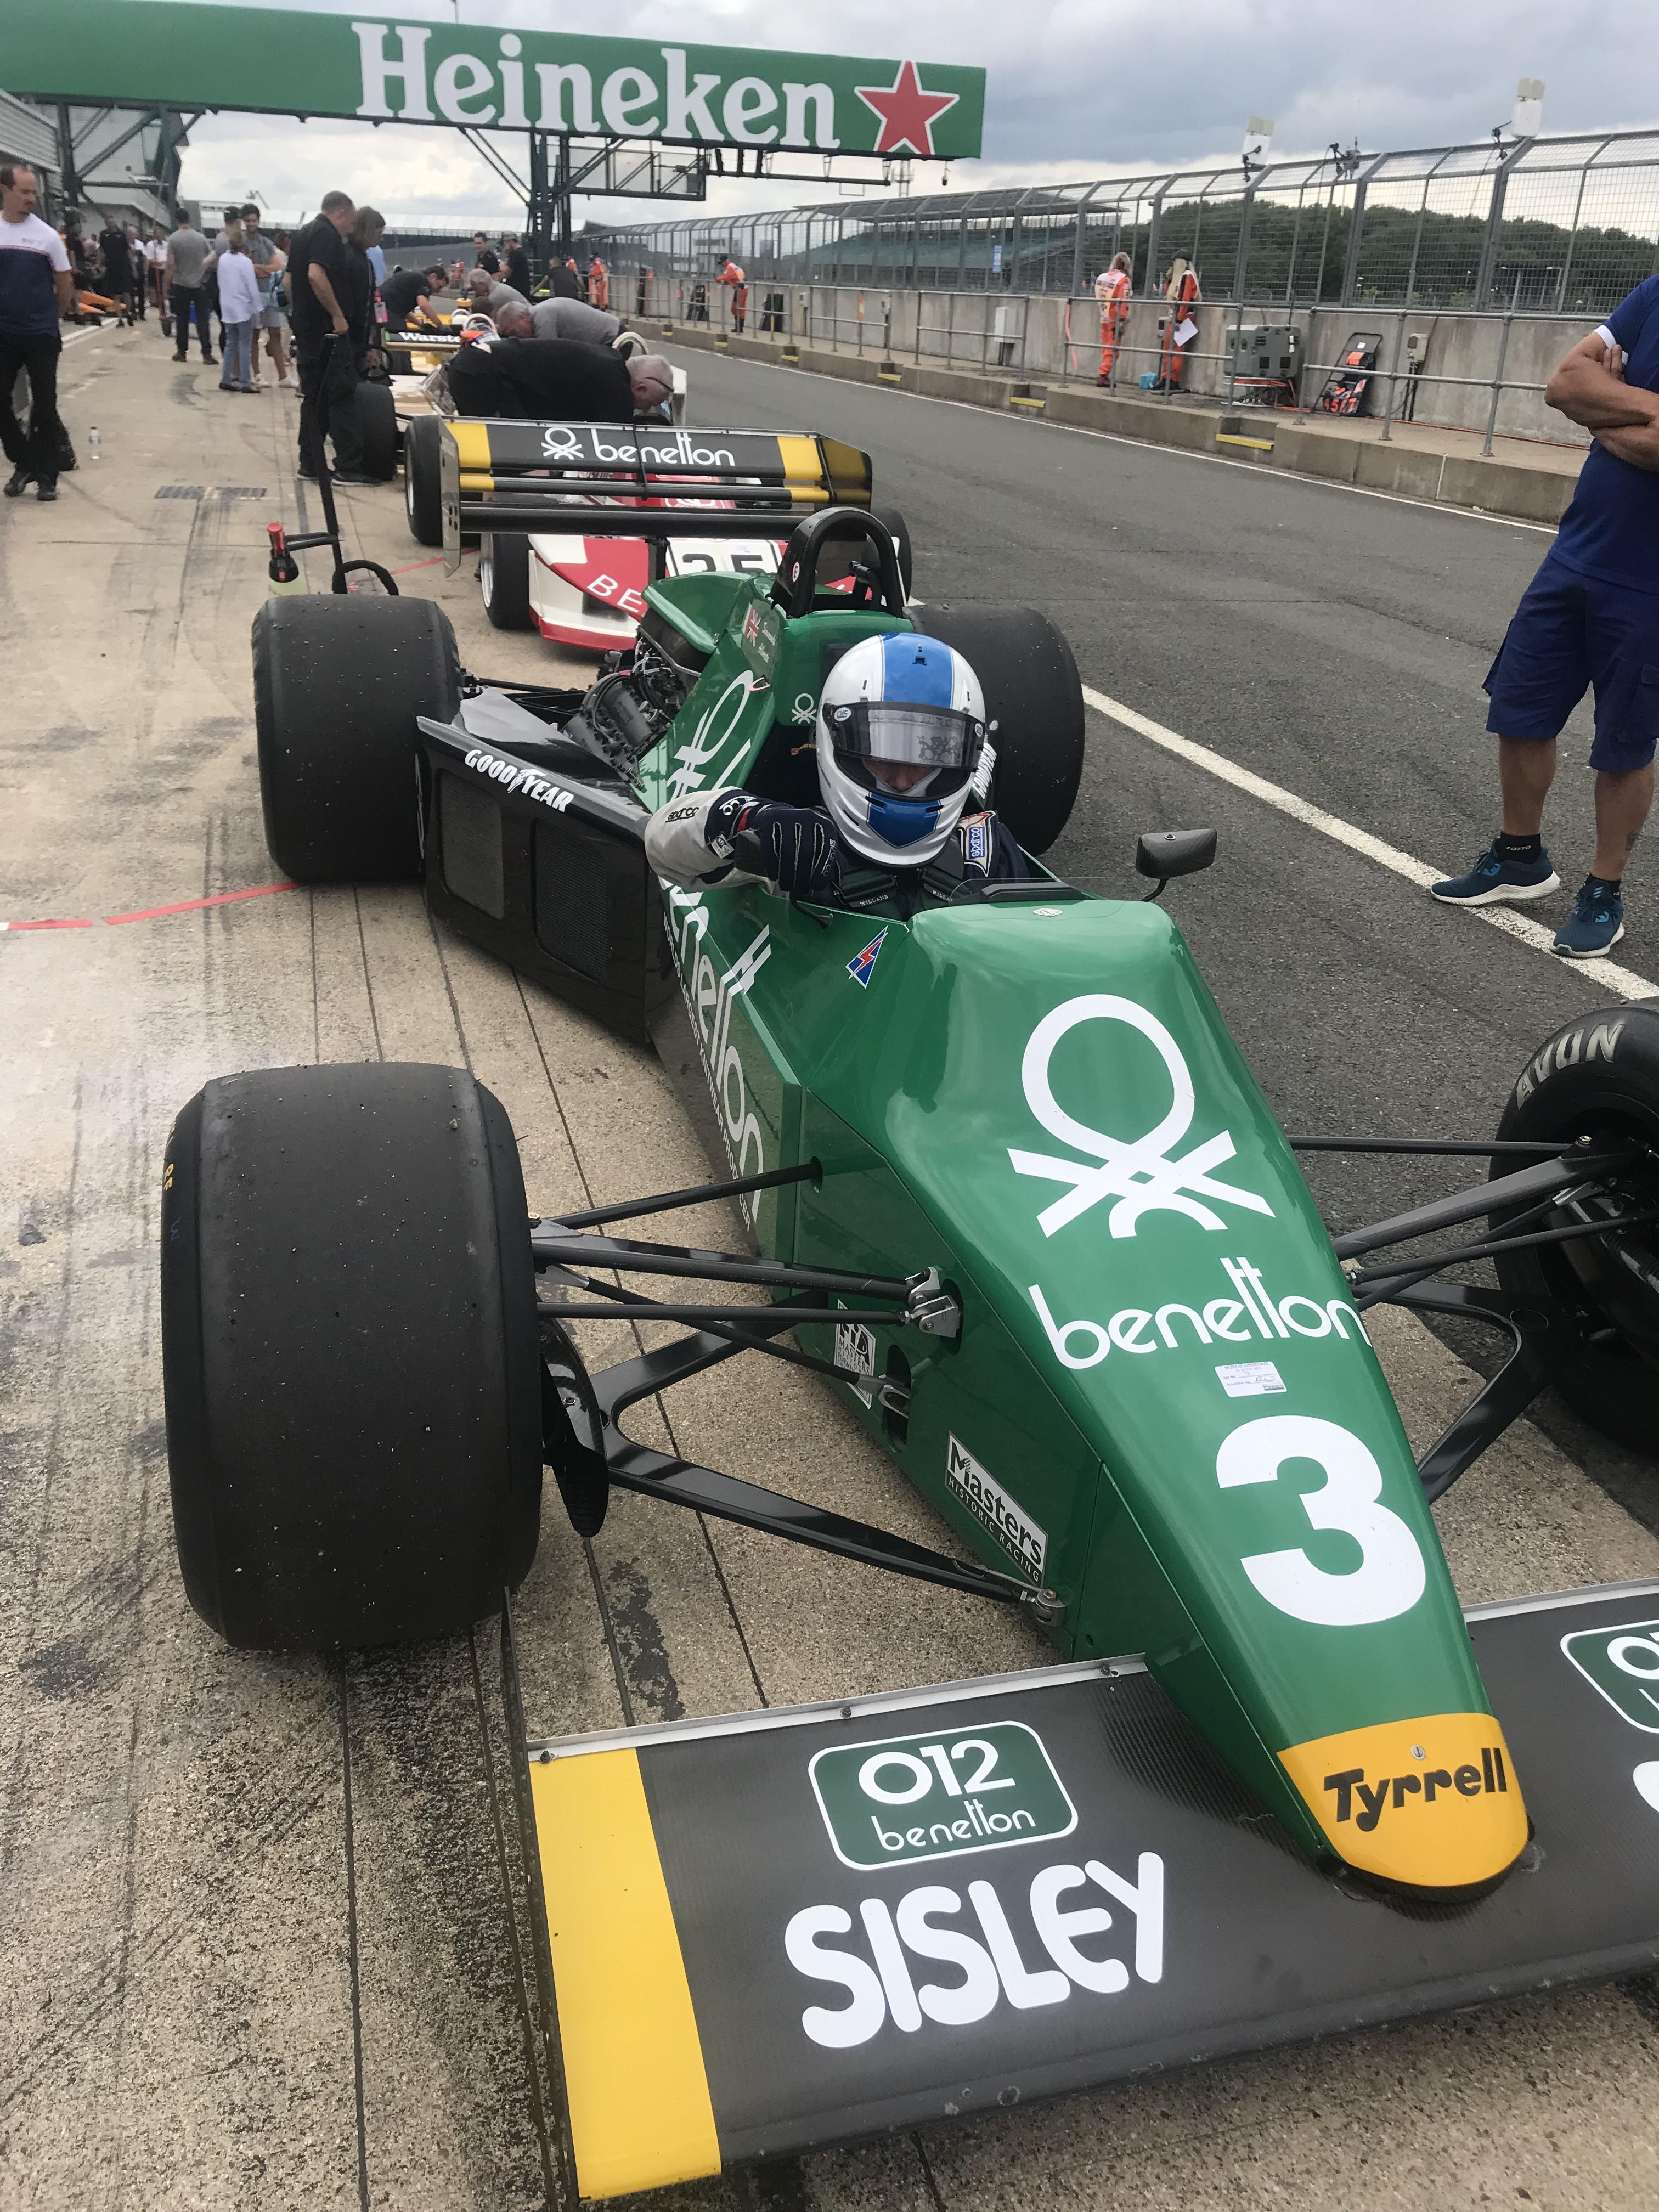 Tyrrell 012 - 01 Silverstone 2019